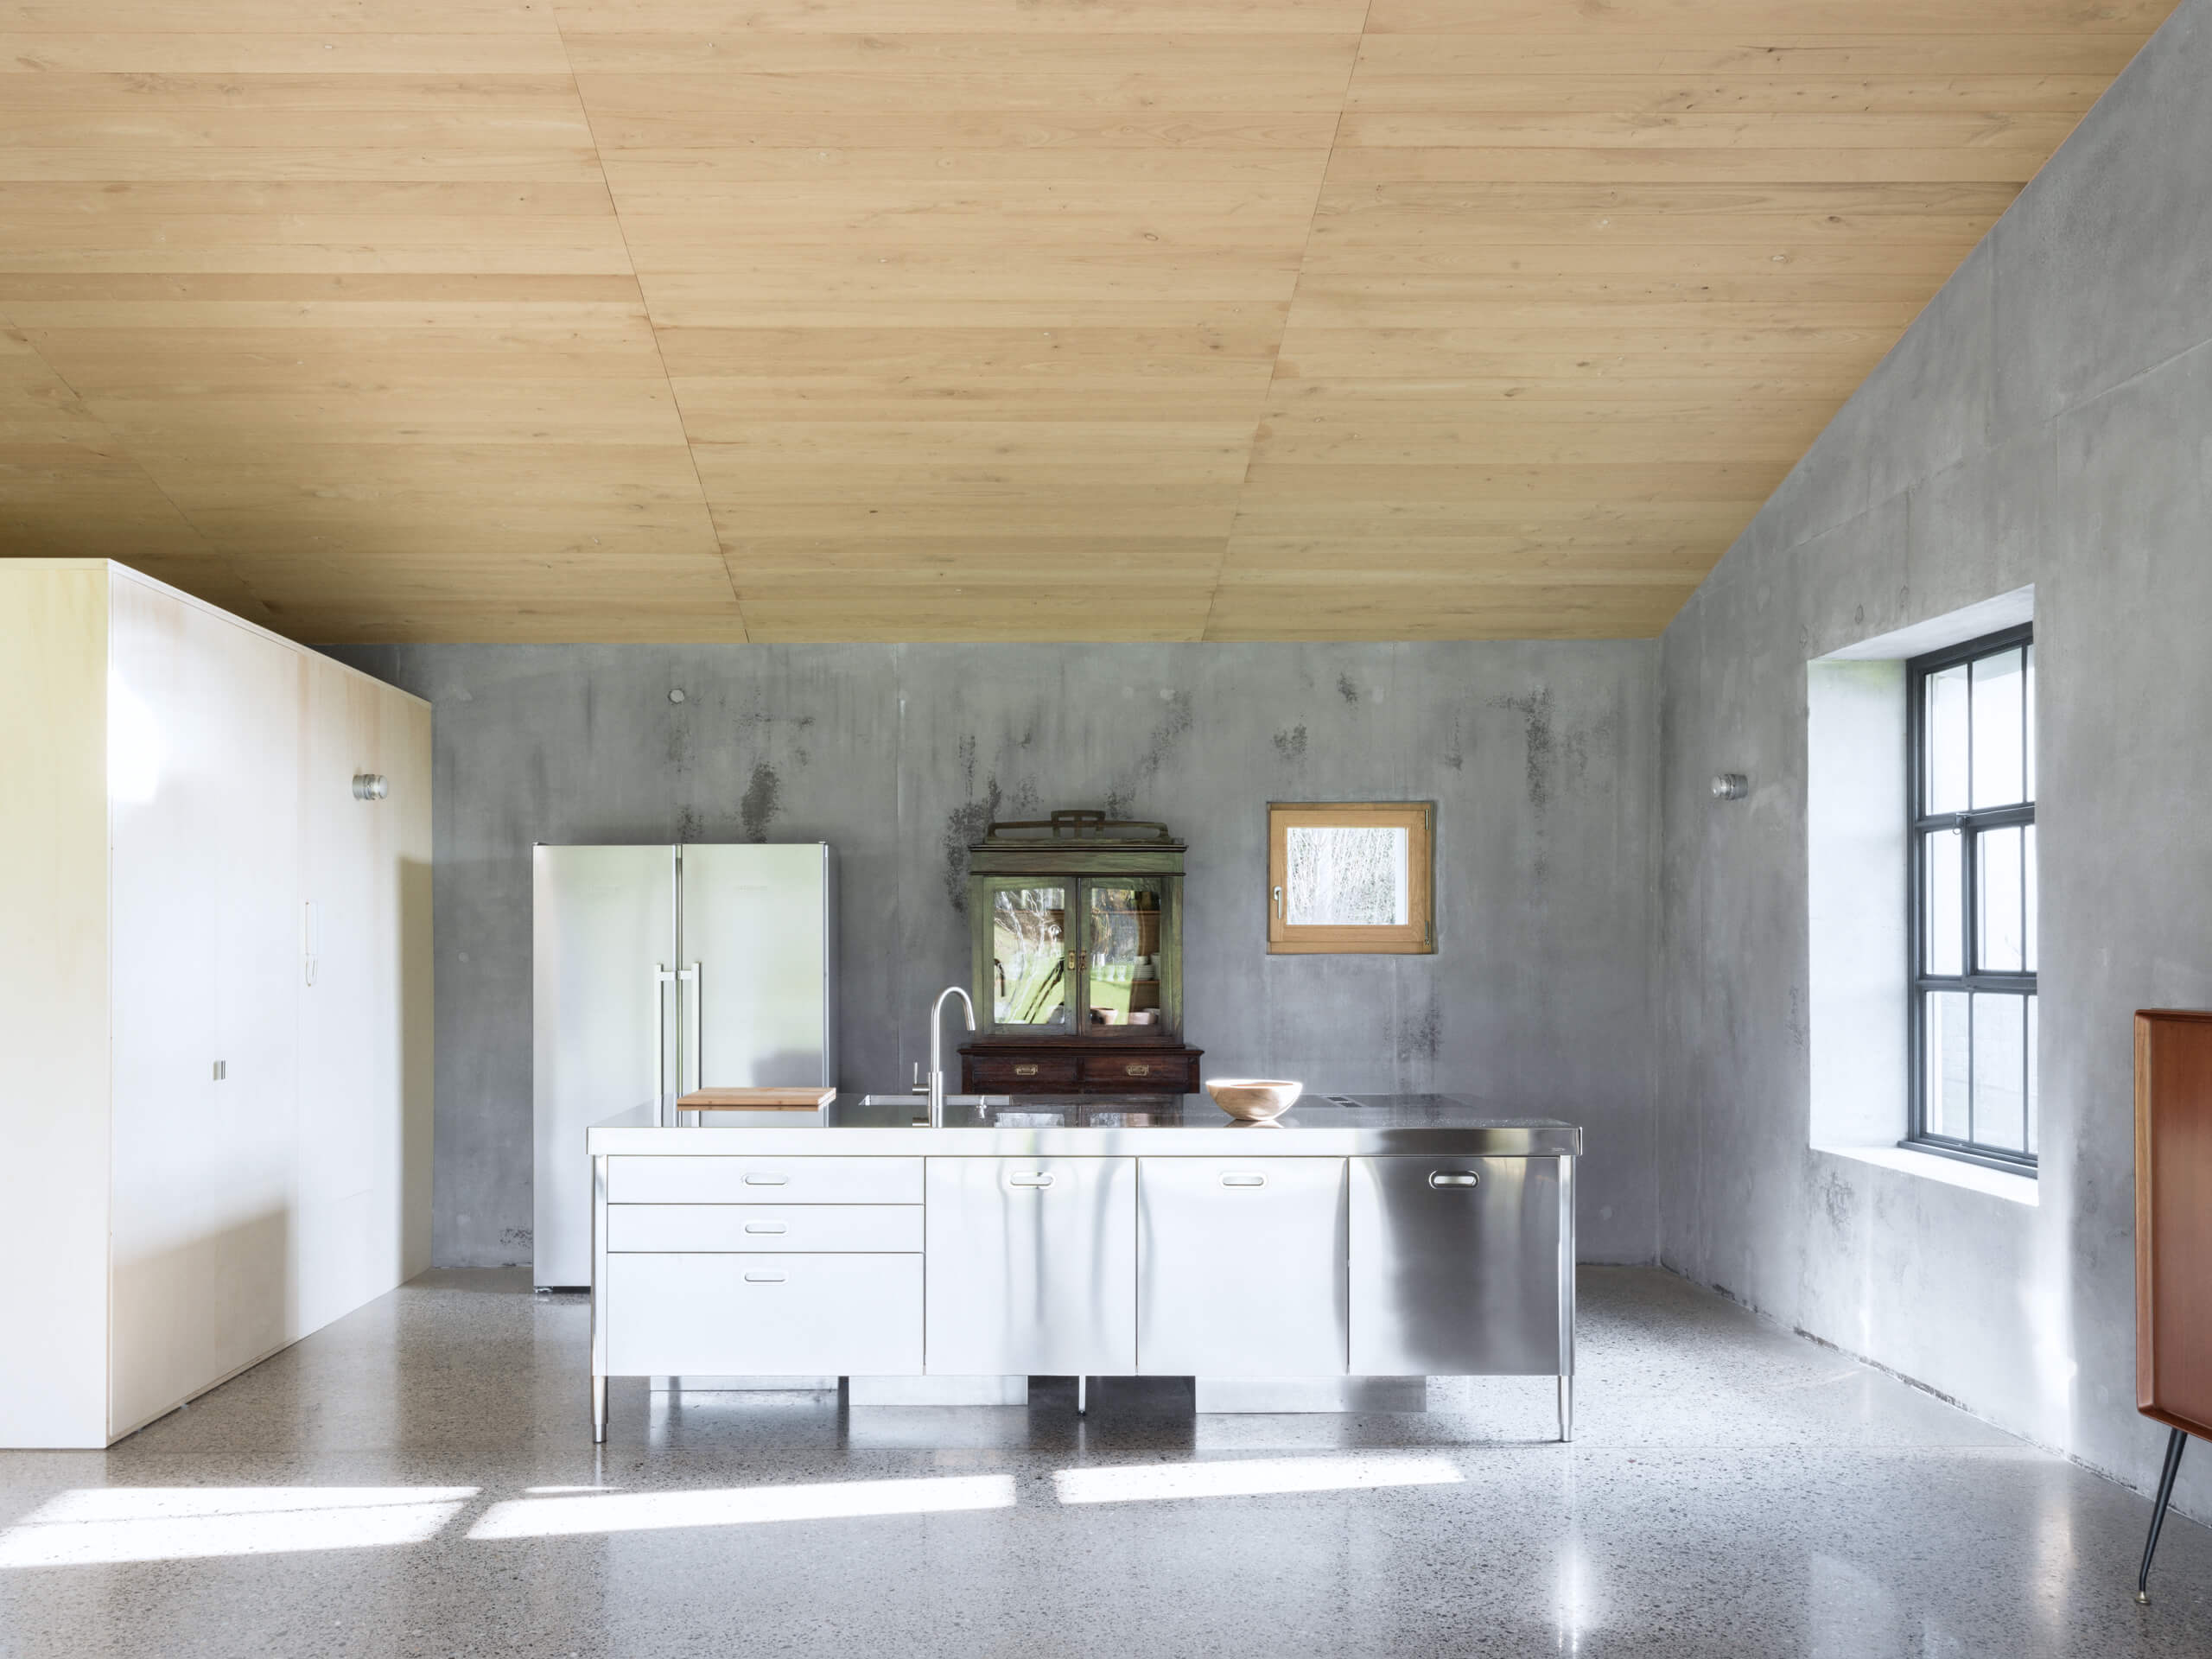 Casa Ell by Marco Ortallli